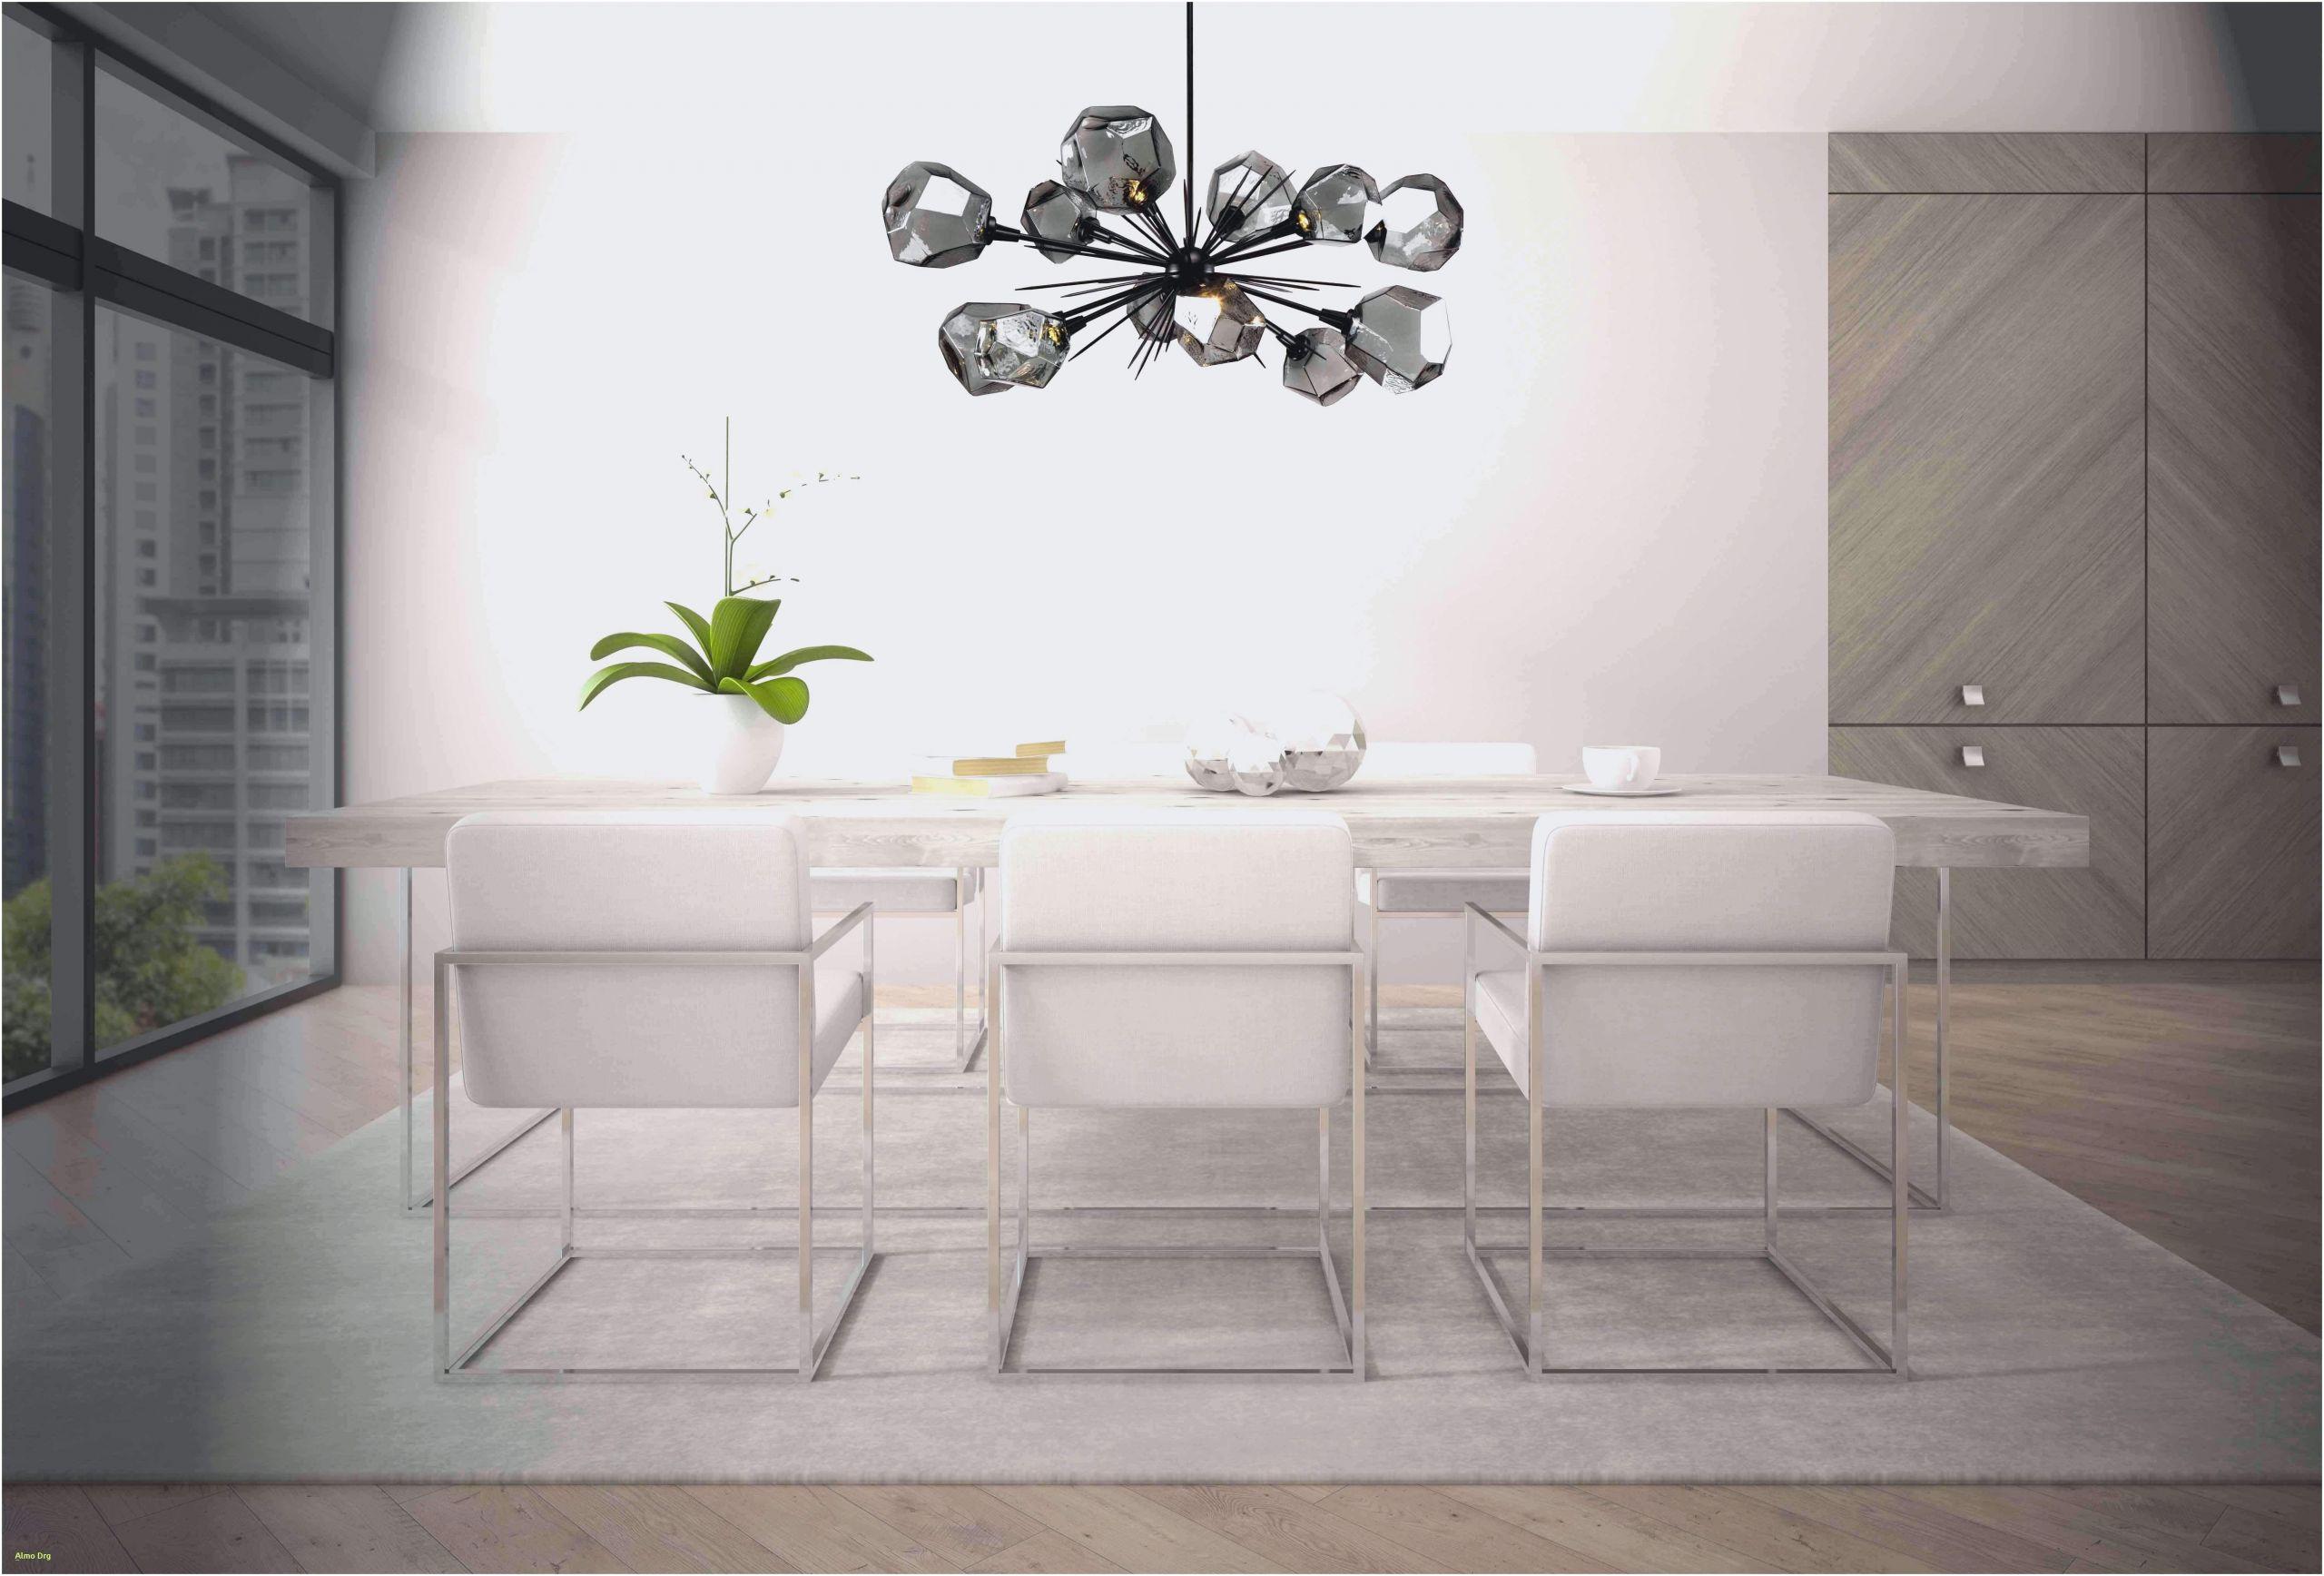 wohnzimmer design ideen luxus luxe led lampe badezimmer bestevon wohnzimmer licht 0d of wohnzimmer design ideen scaled